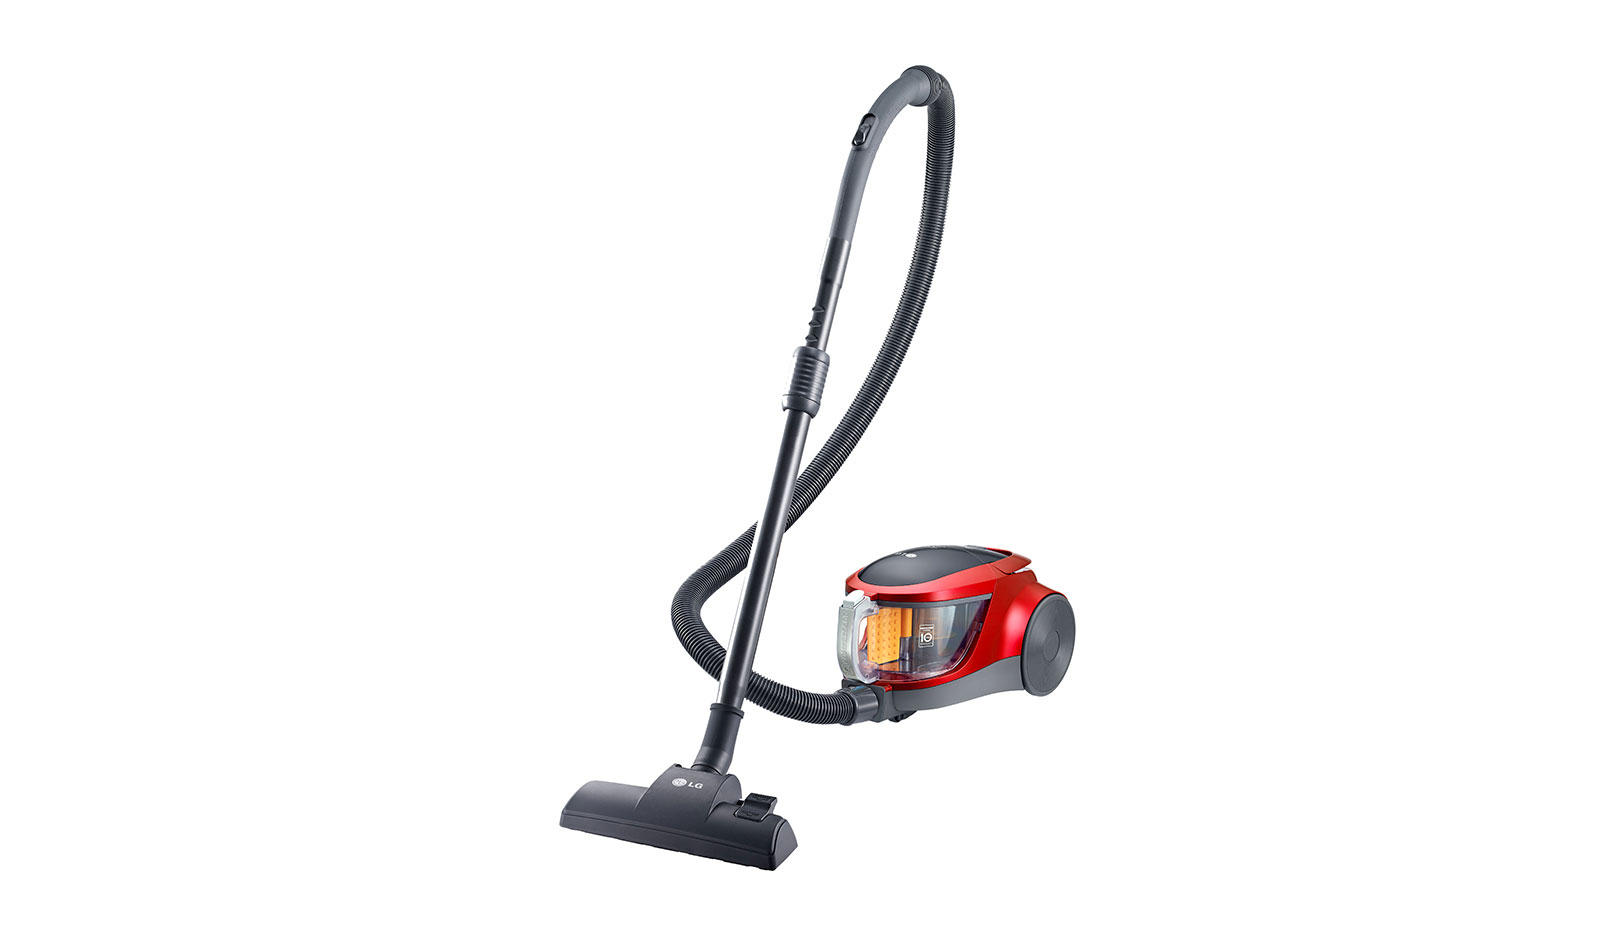 Dragon Electronics | LG 2000W Vacuum Cleaner VK5320NNT